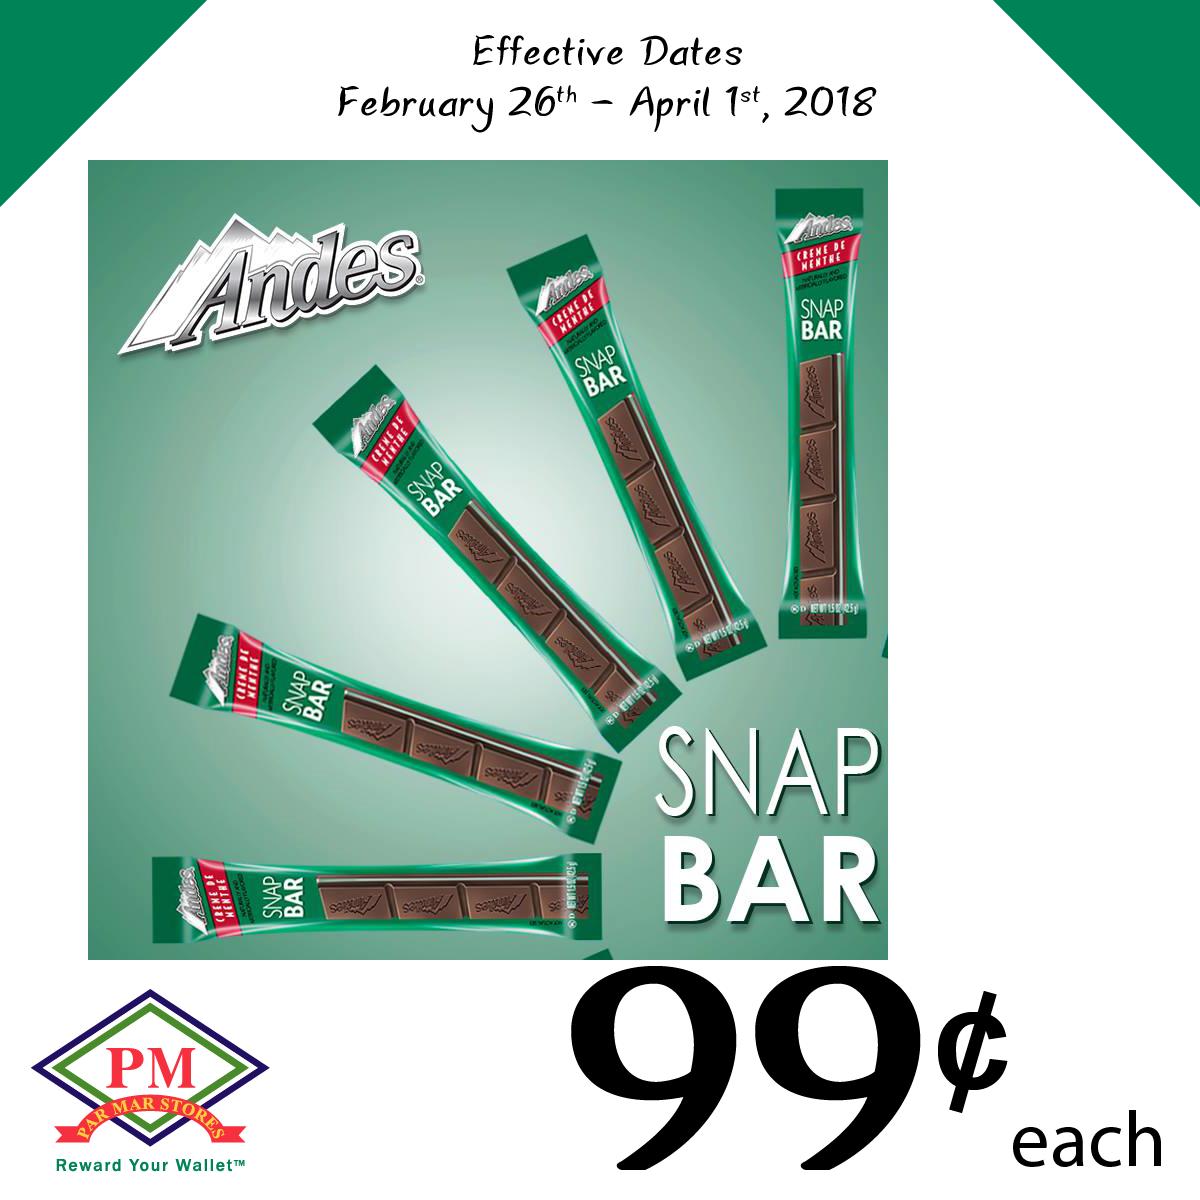 Snap Bar